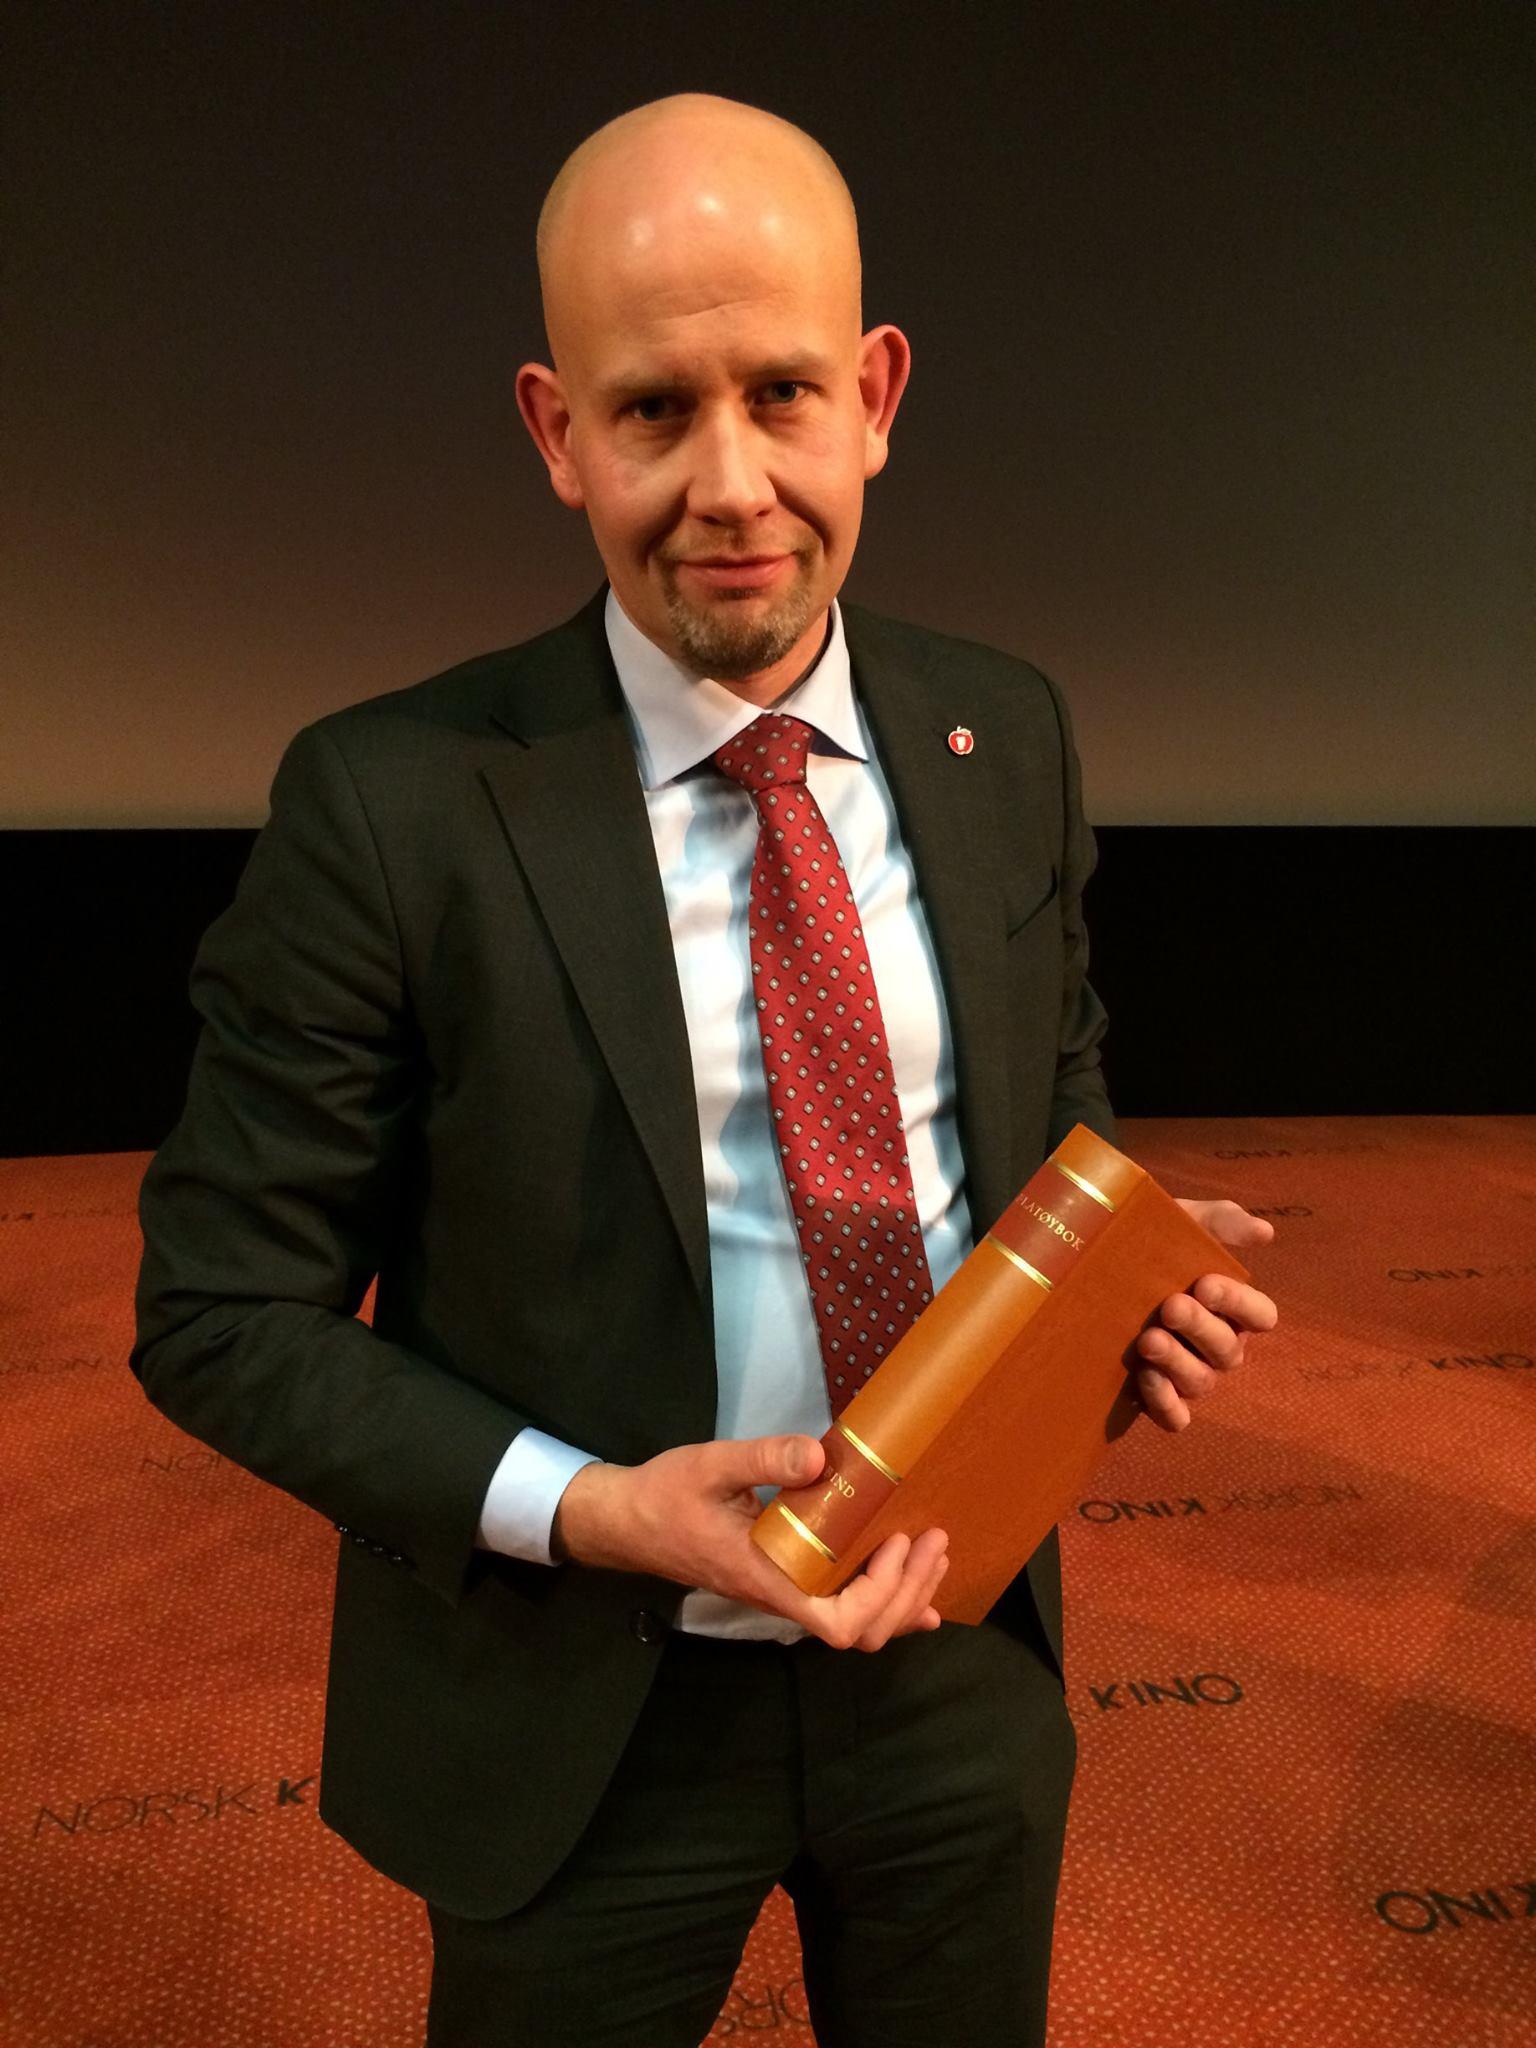 Former Norwegian minister of petrolium and energy Tord Lien with Flateyjarbok vol. 1.